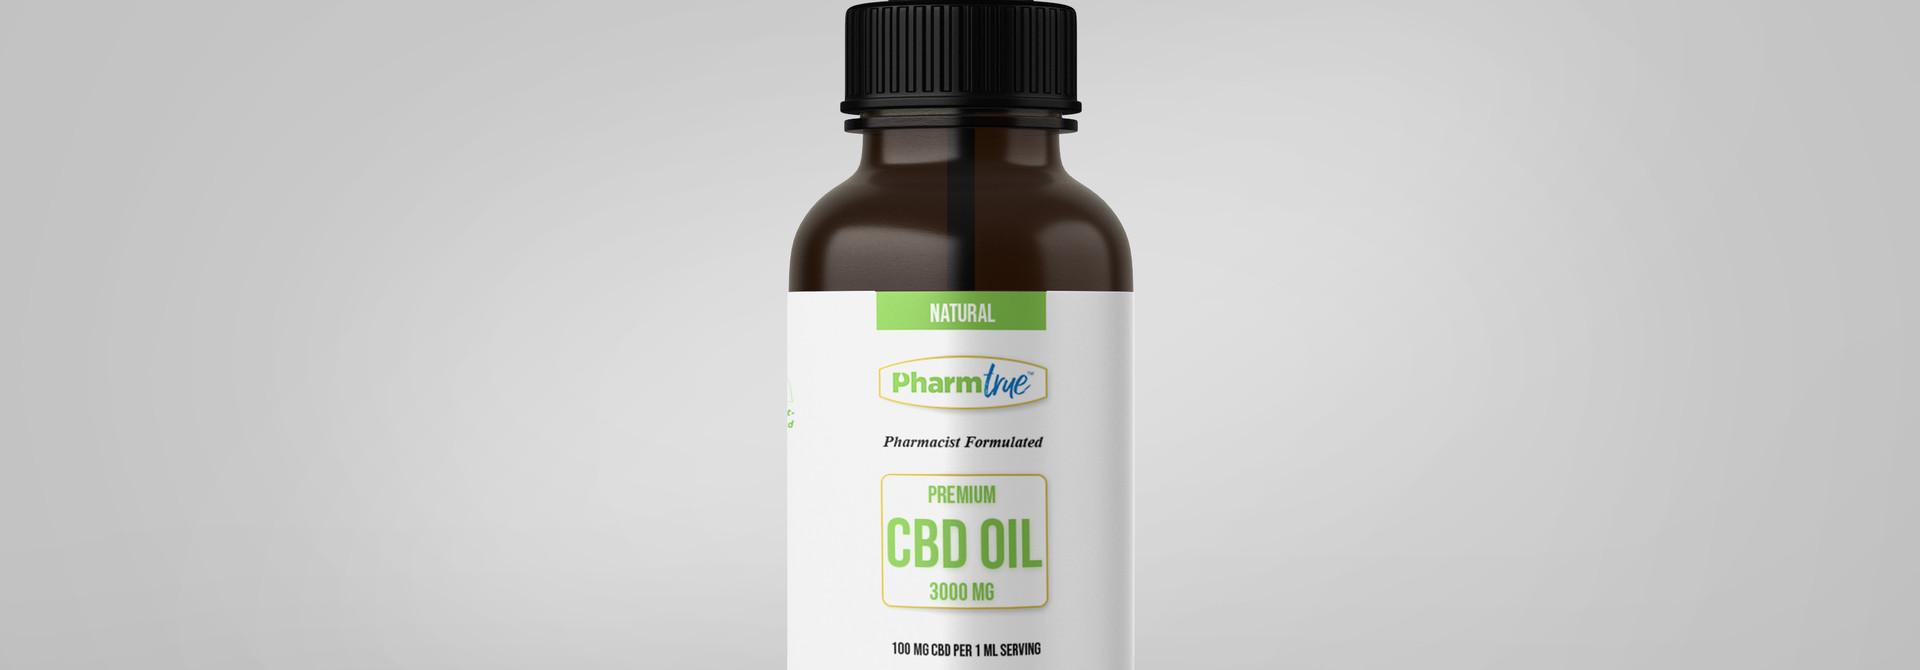 CBD OIL 3000 mg TINCTURE - Natural